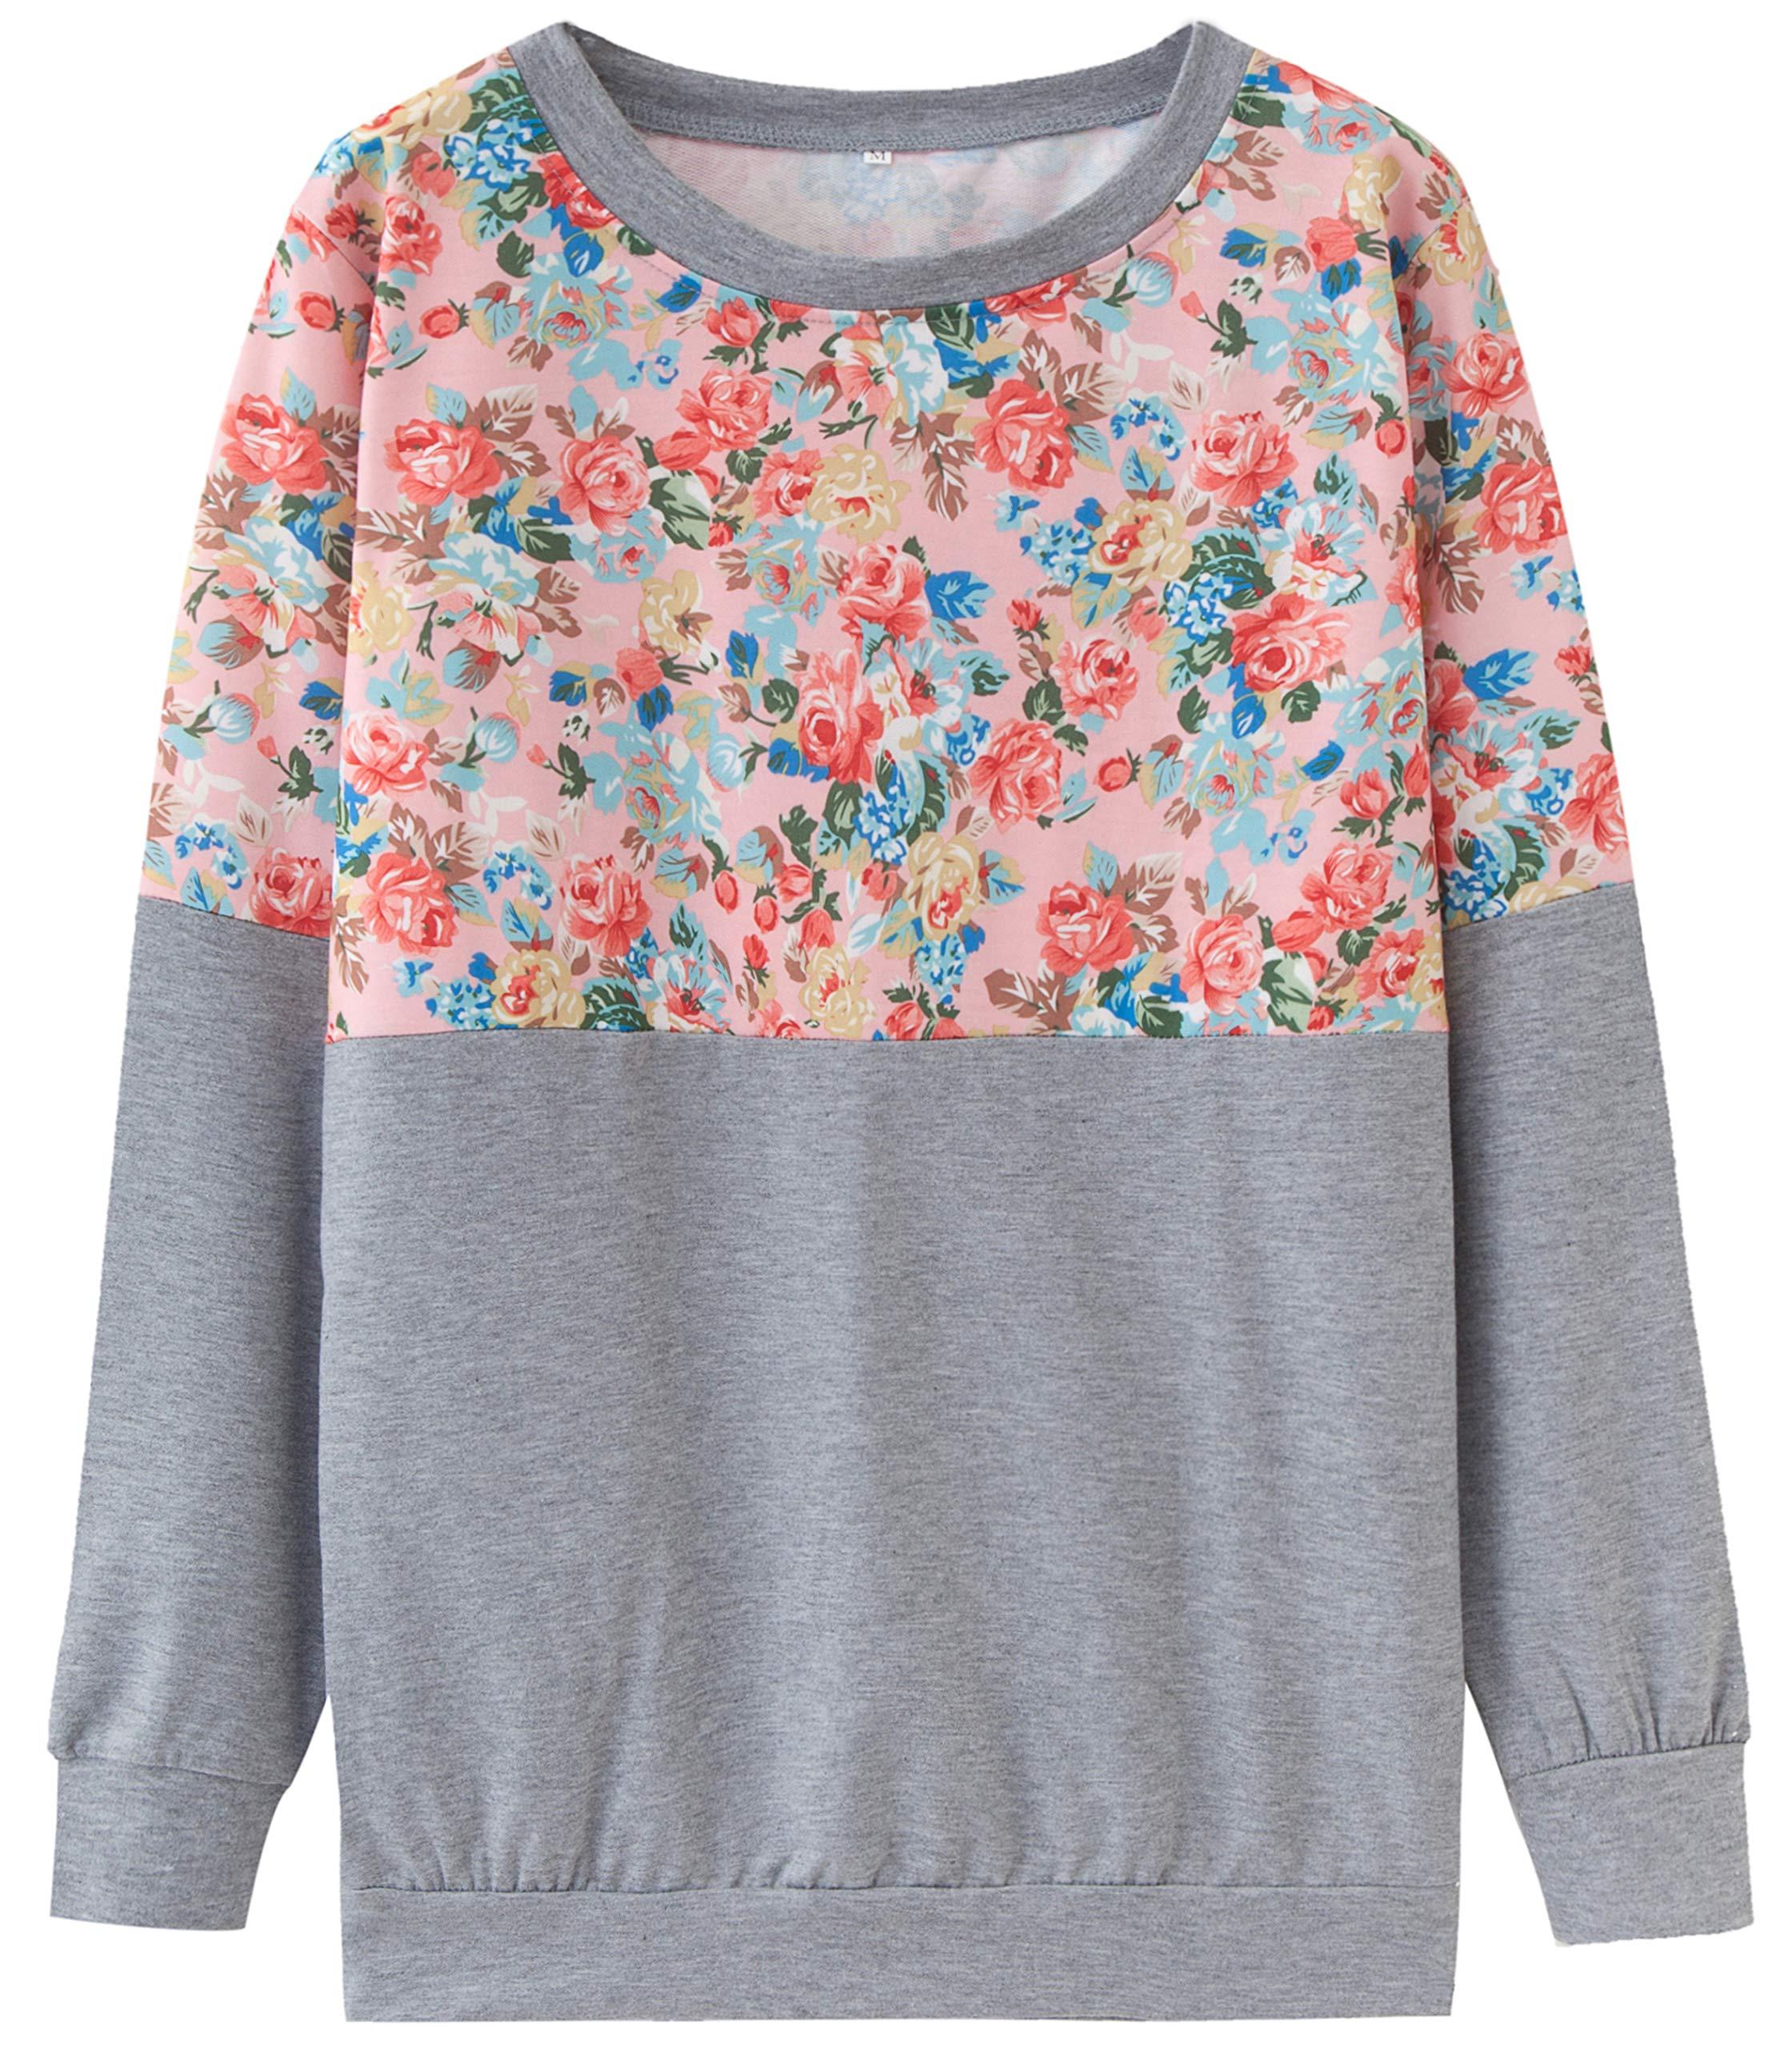 Finoceans Woman Sweatshirt Tunic Crew Neck Fall Stylish Tops Grey